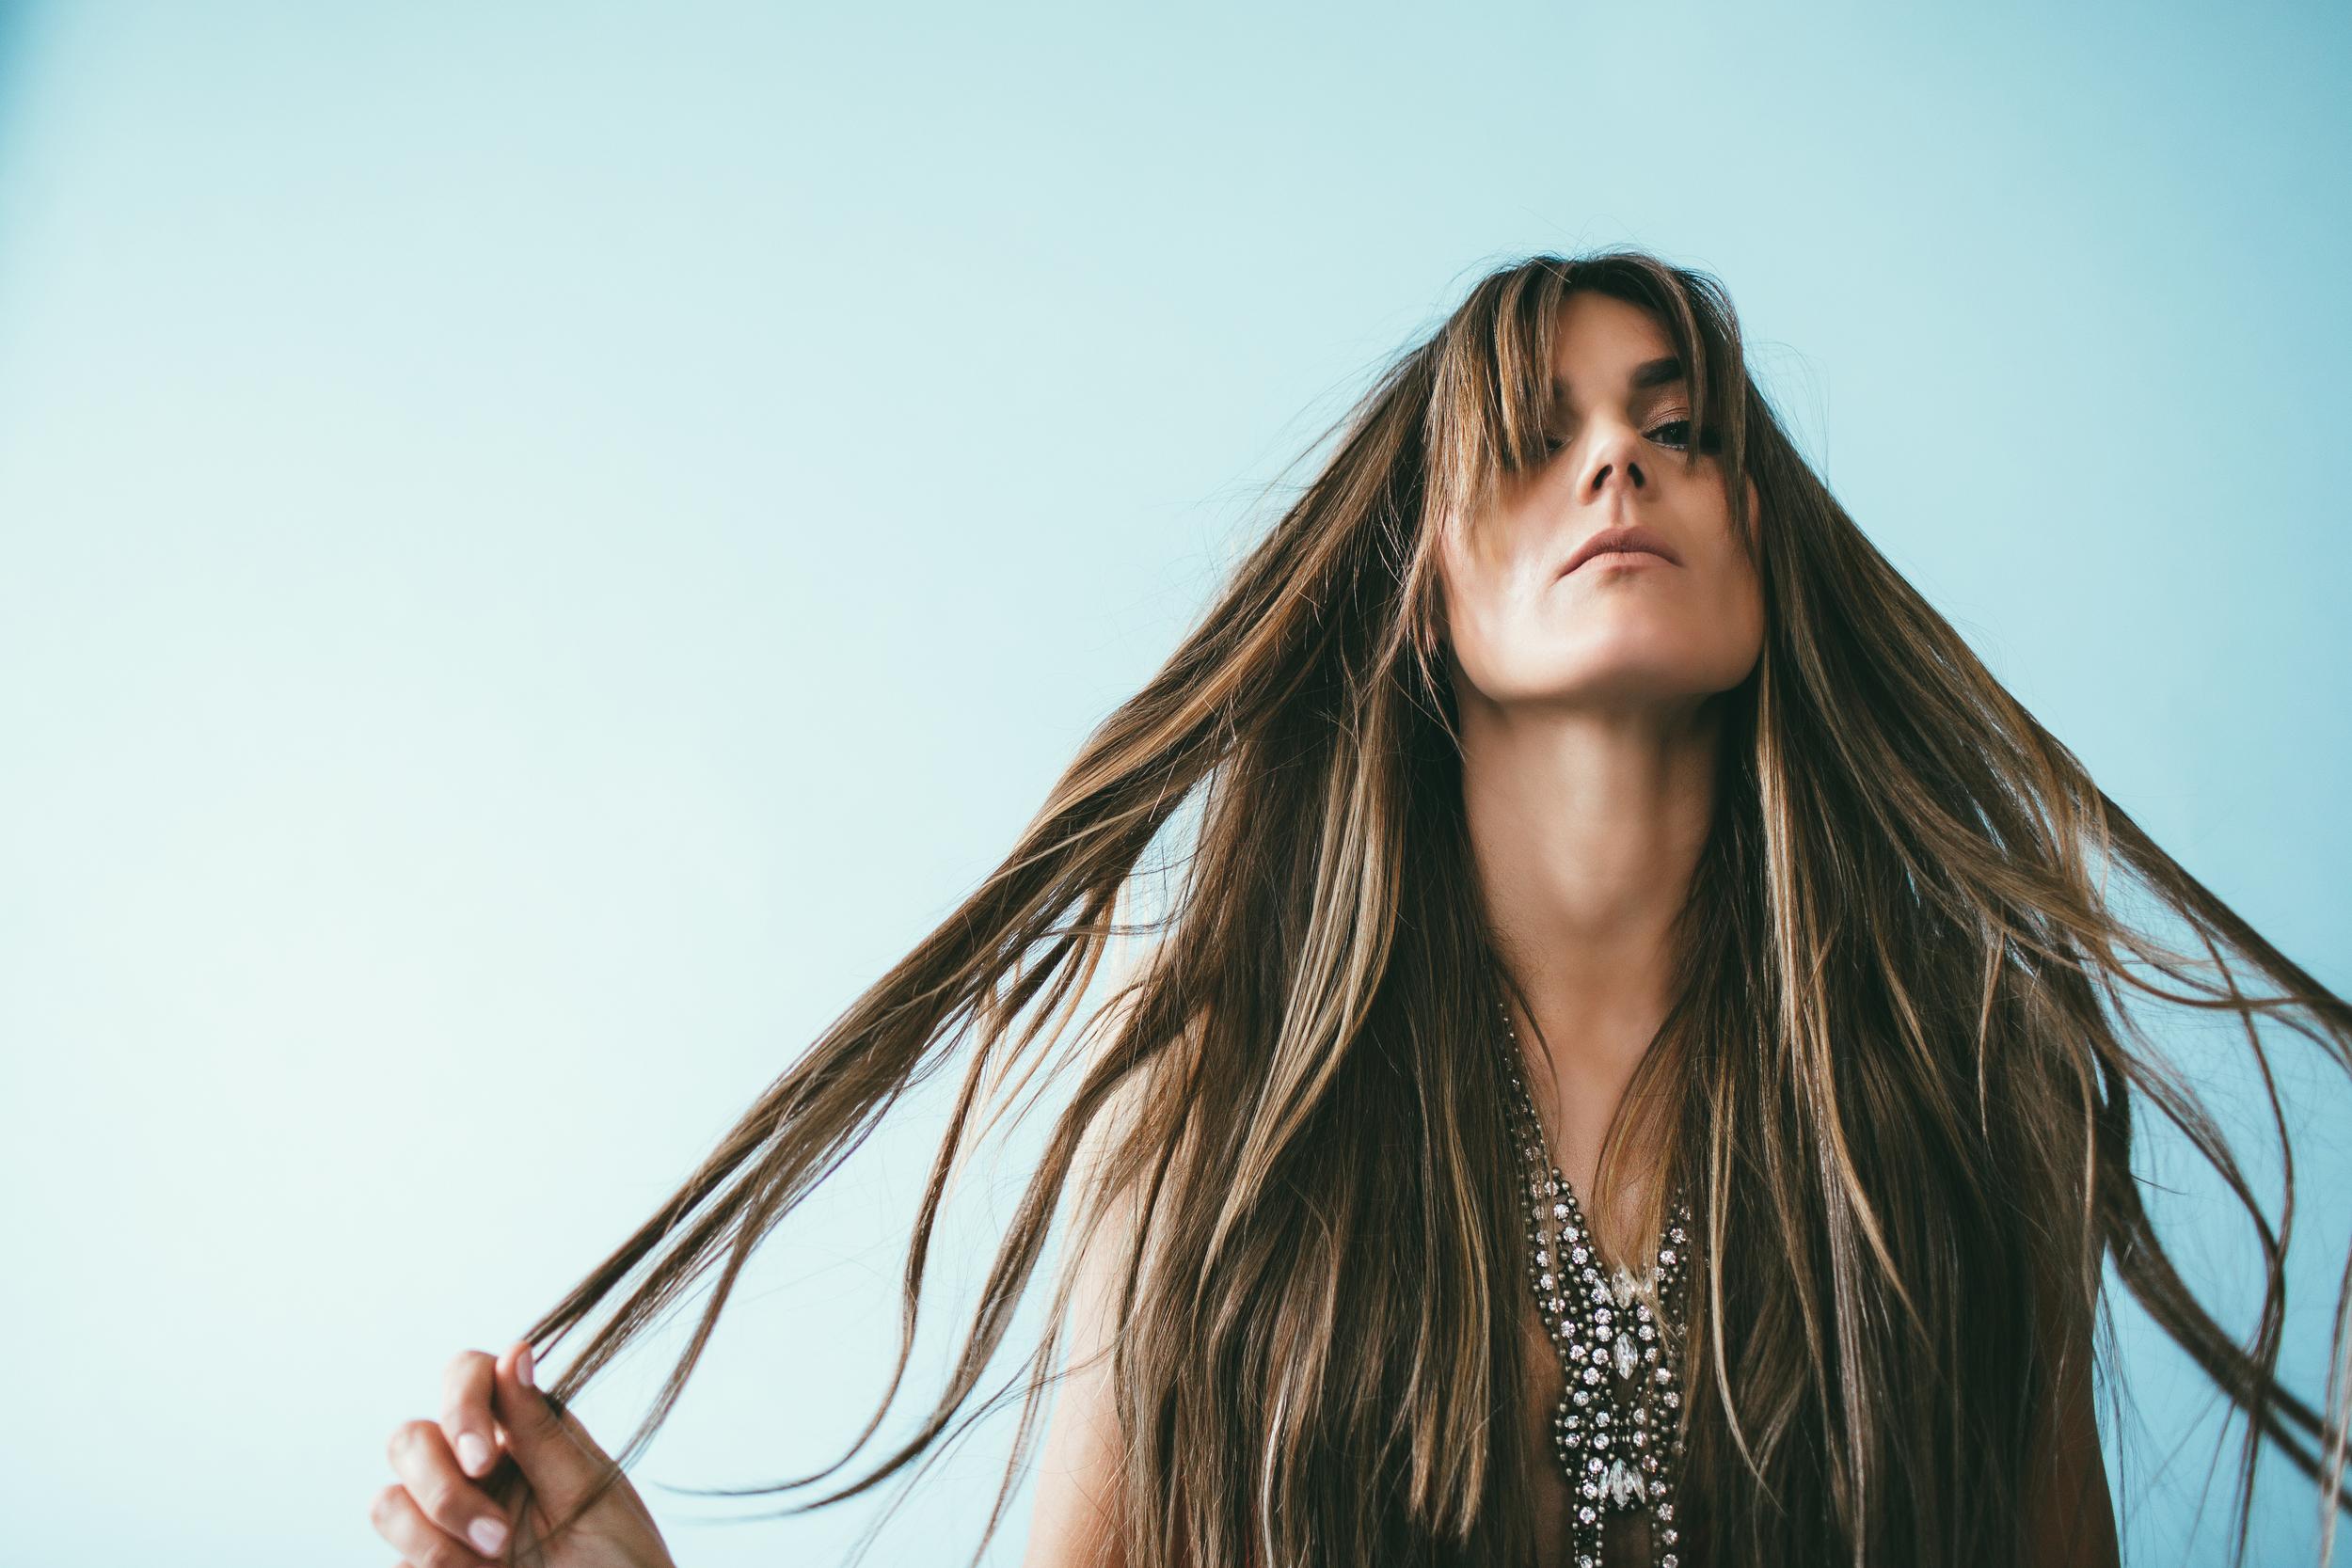 Model: Tessa Barton Product: Bohyme Luxe Hand-Tied Silky Straight (Color M4/30) Hair Stylist: Tatum Wetzel